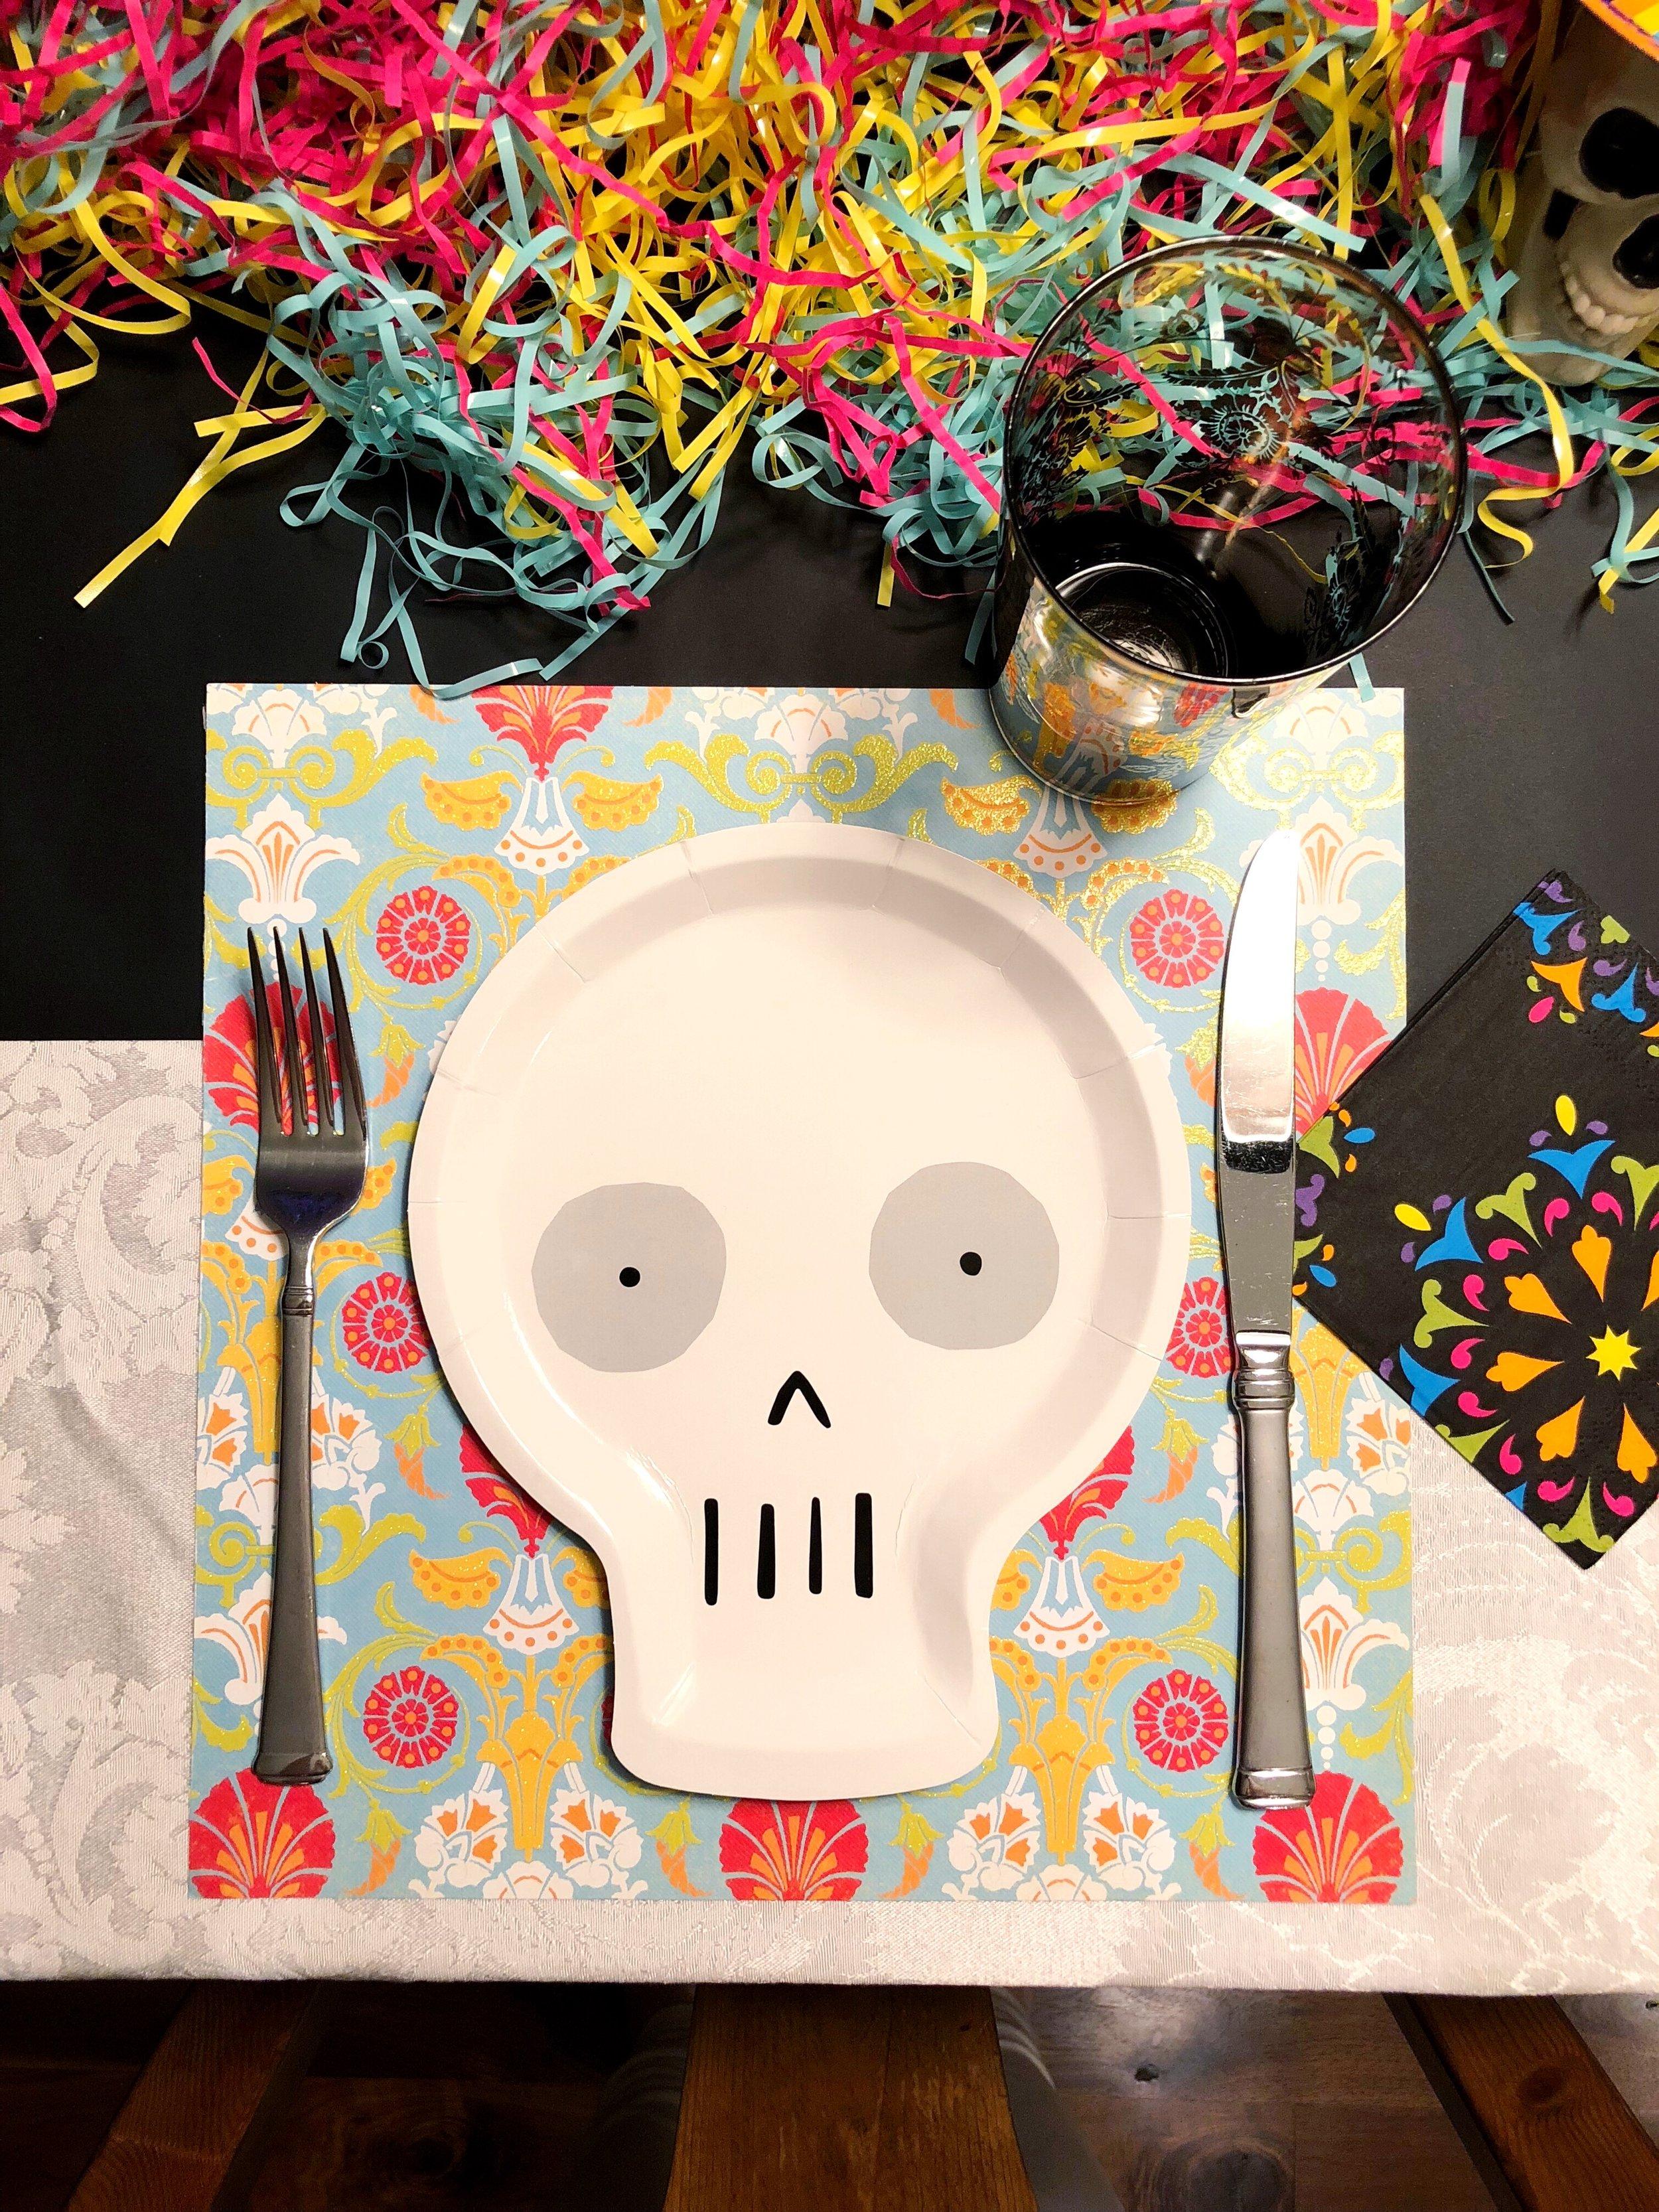 Skull Plate_Meri Meri_Design Organize Party_Dia de los muertos.jpg